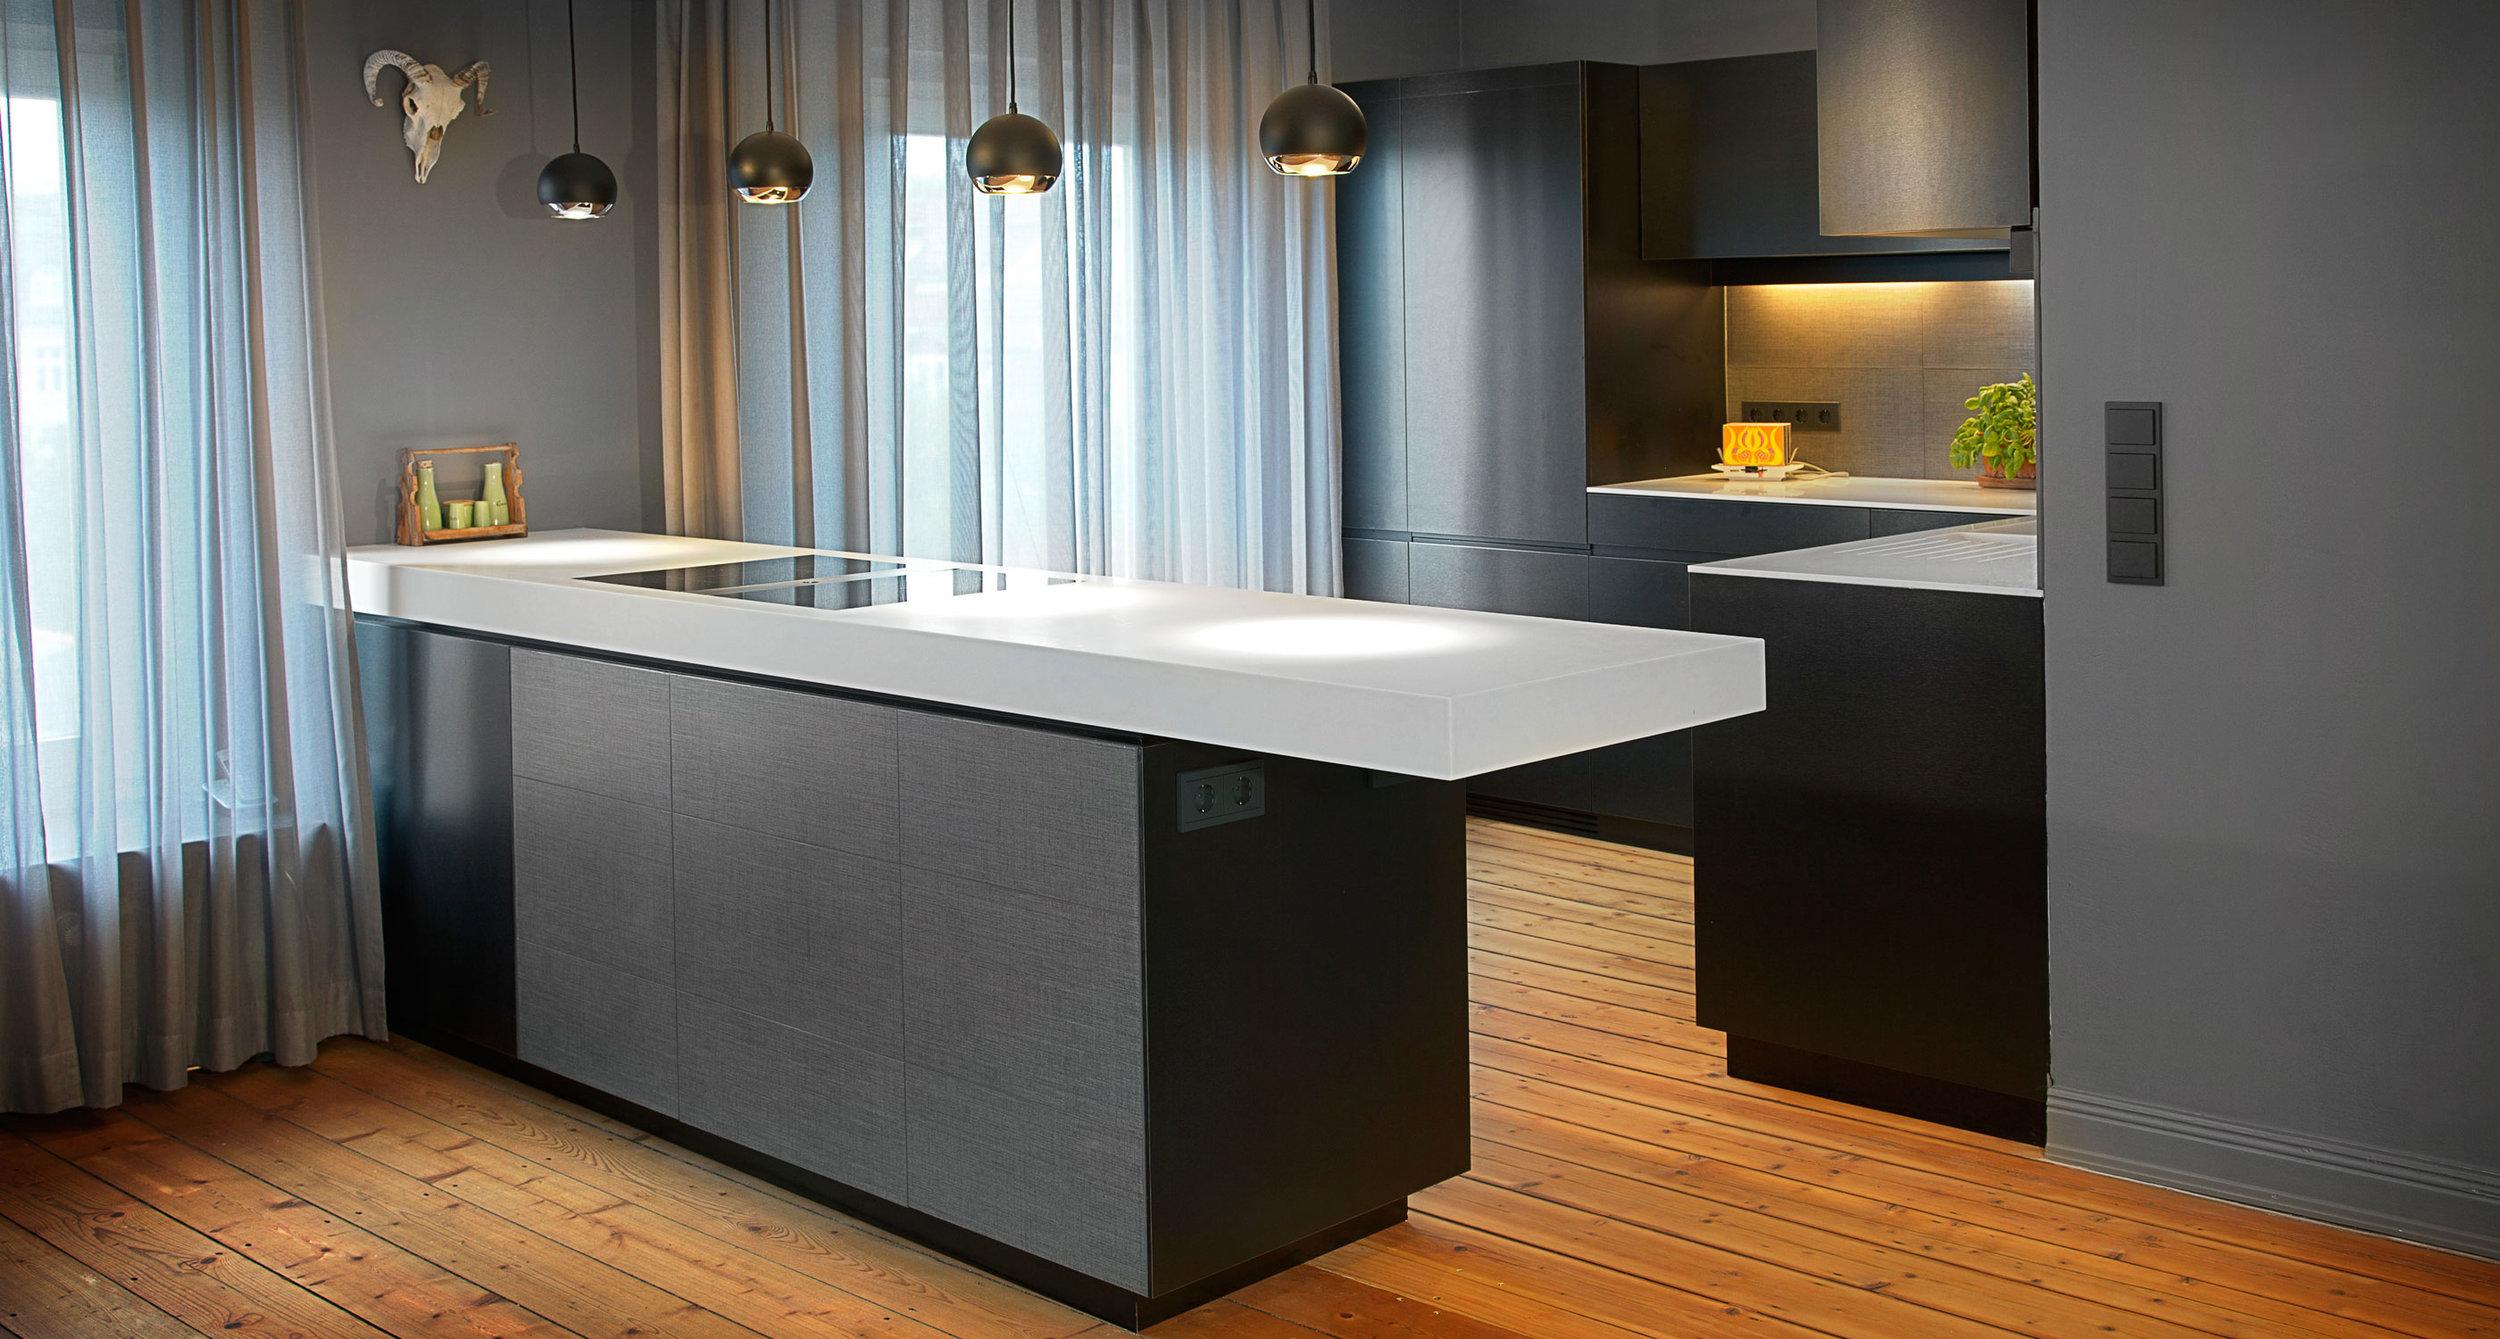 Private kitchen. - Privat, Küche in Hamburg